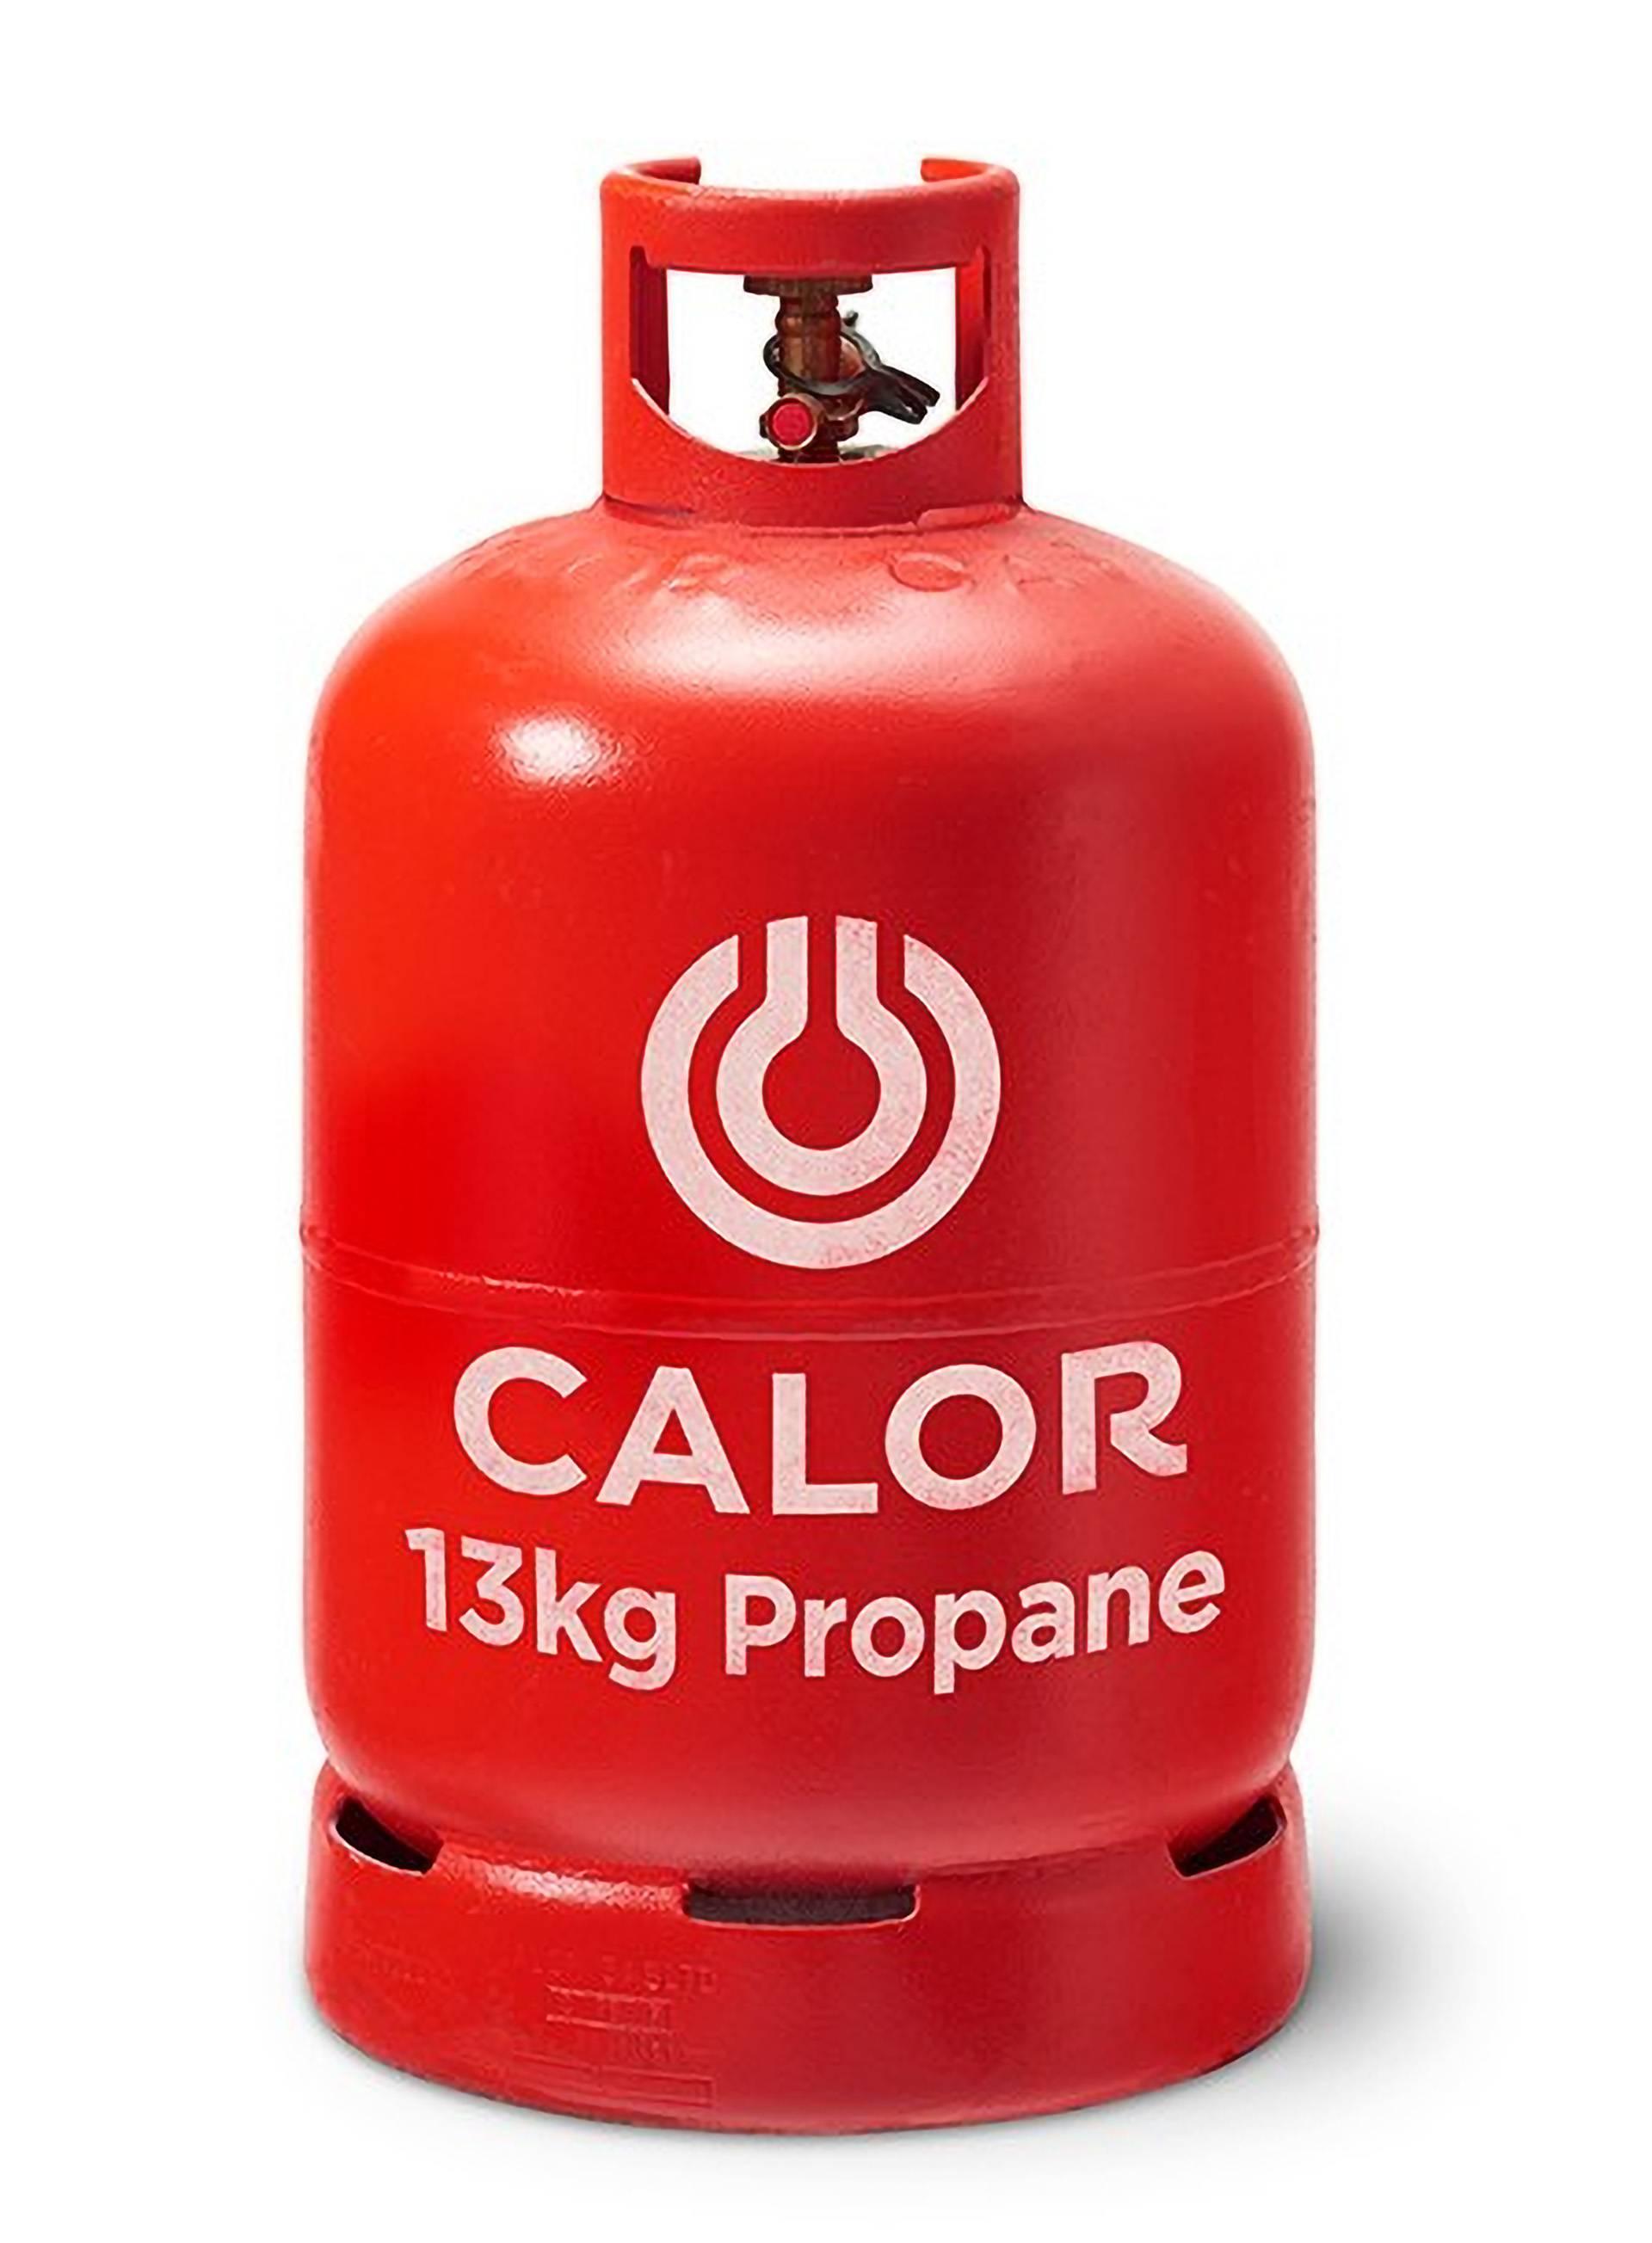 GAS - PROPANE 13KG